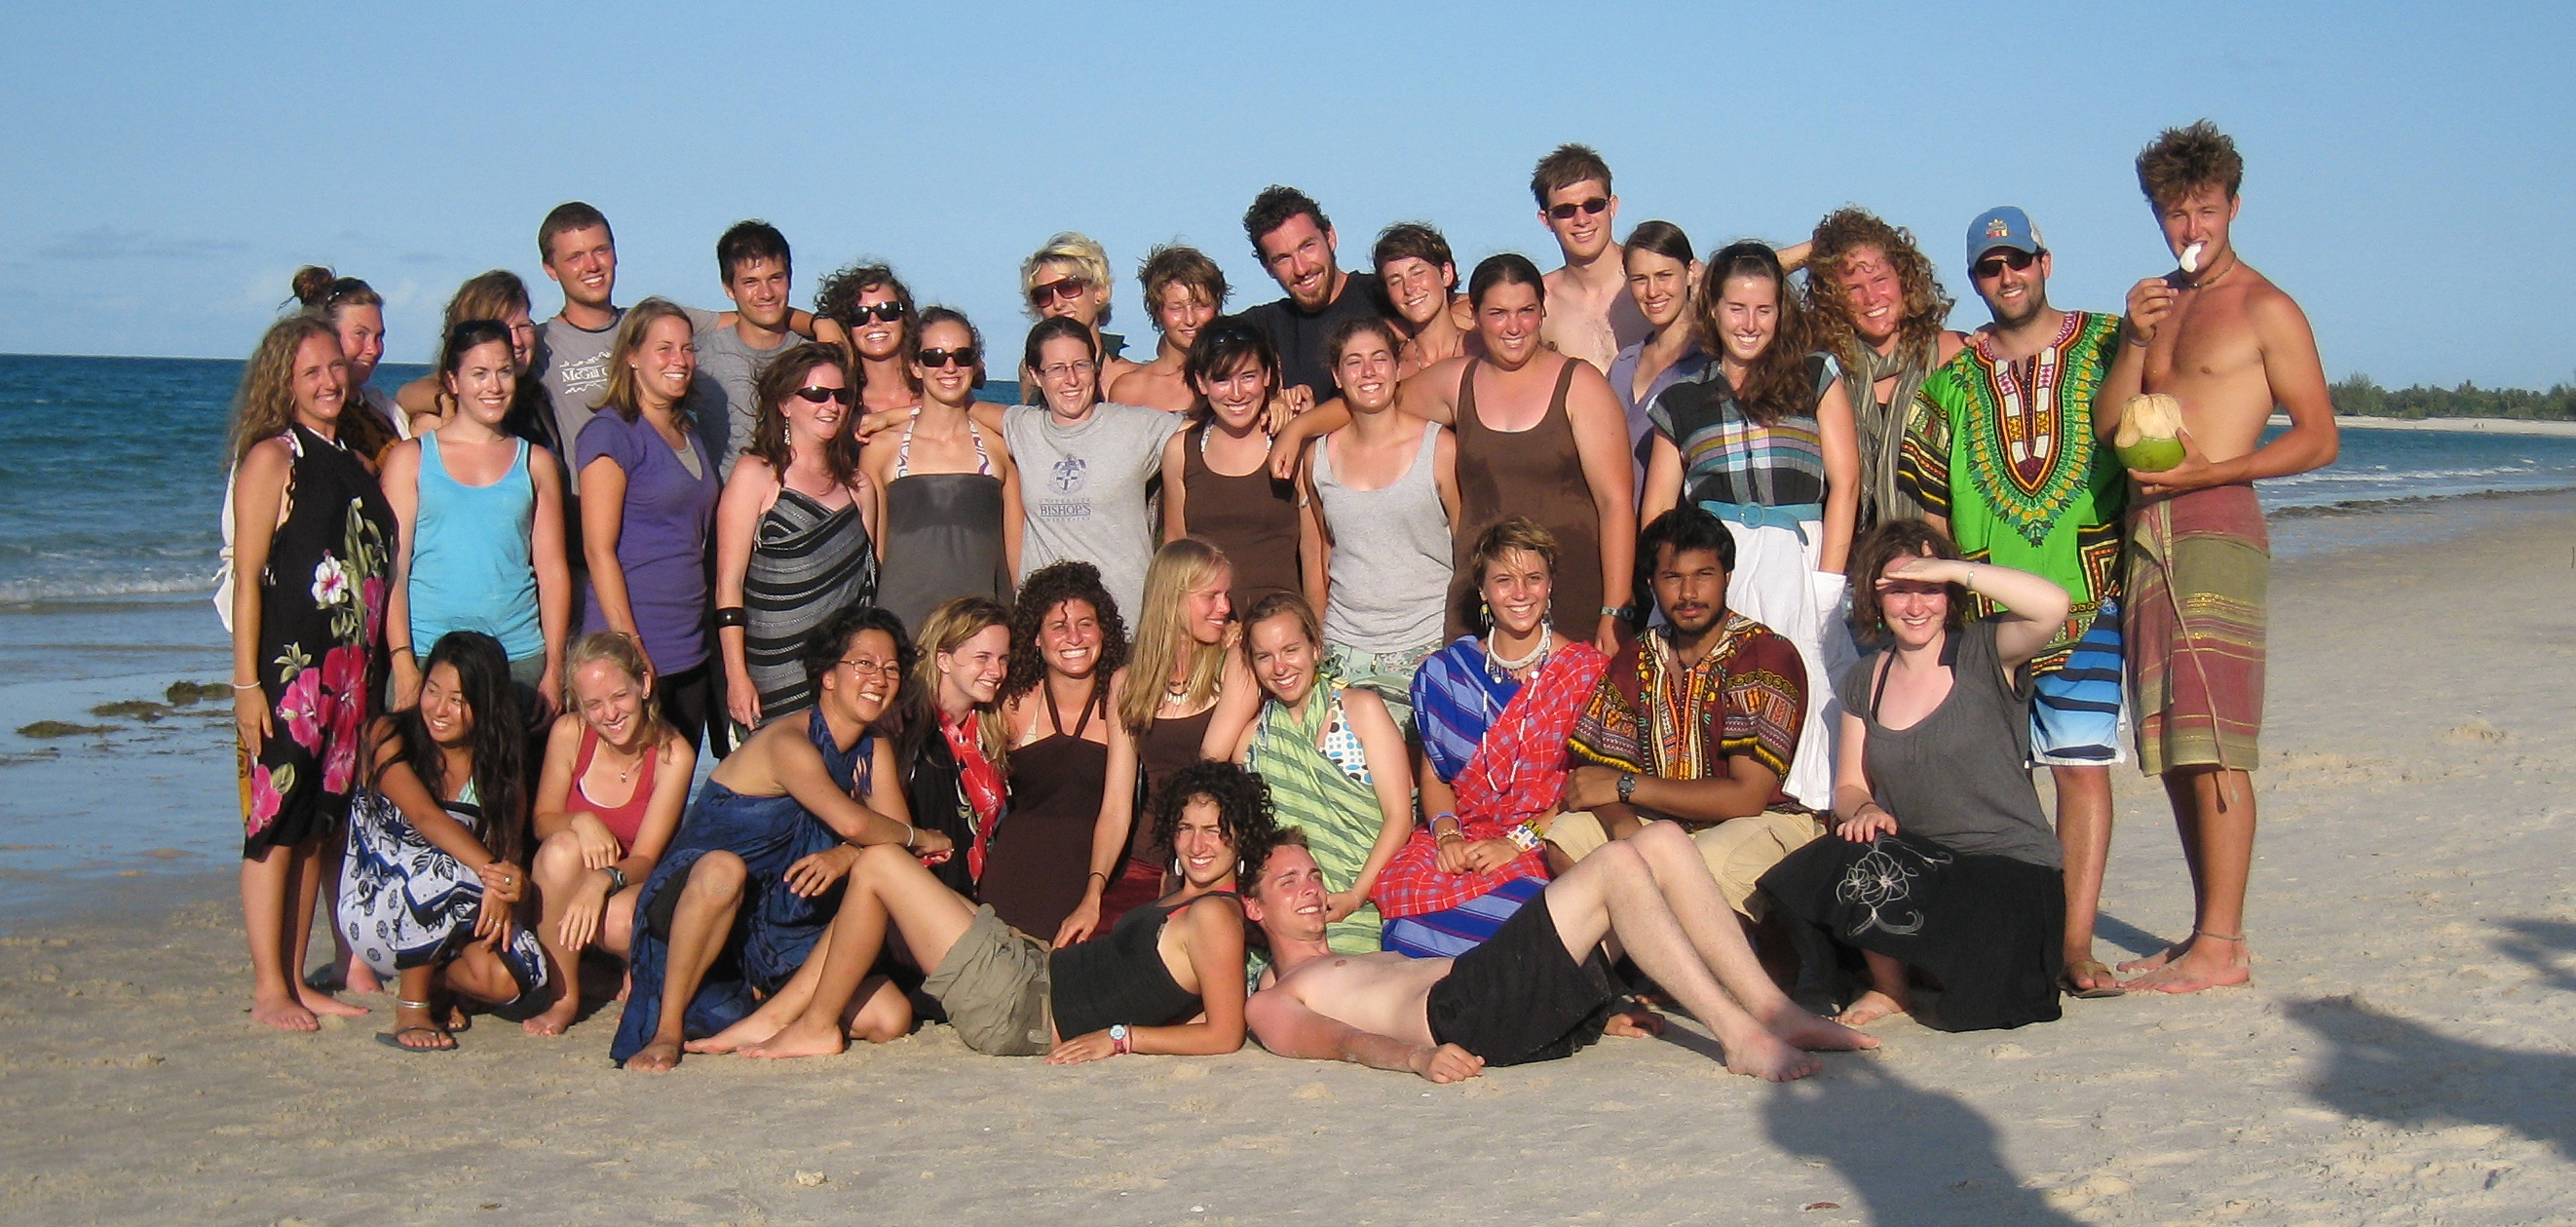 CFSIA beach 2008